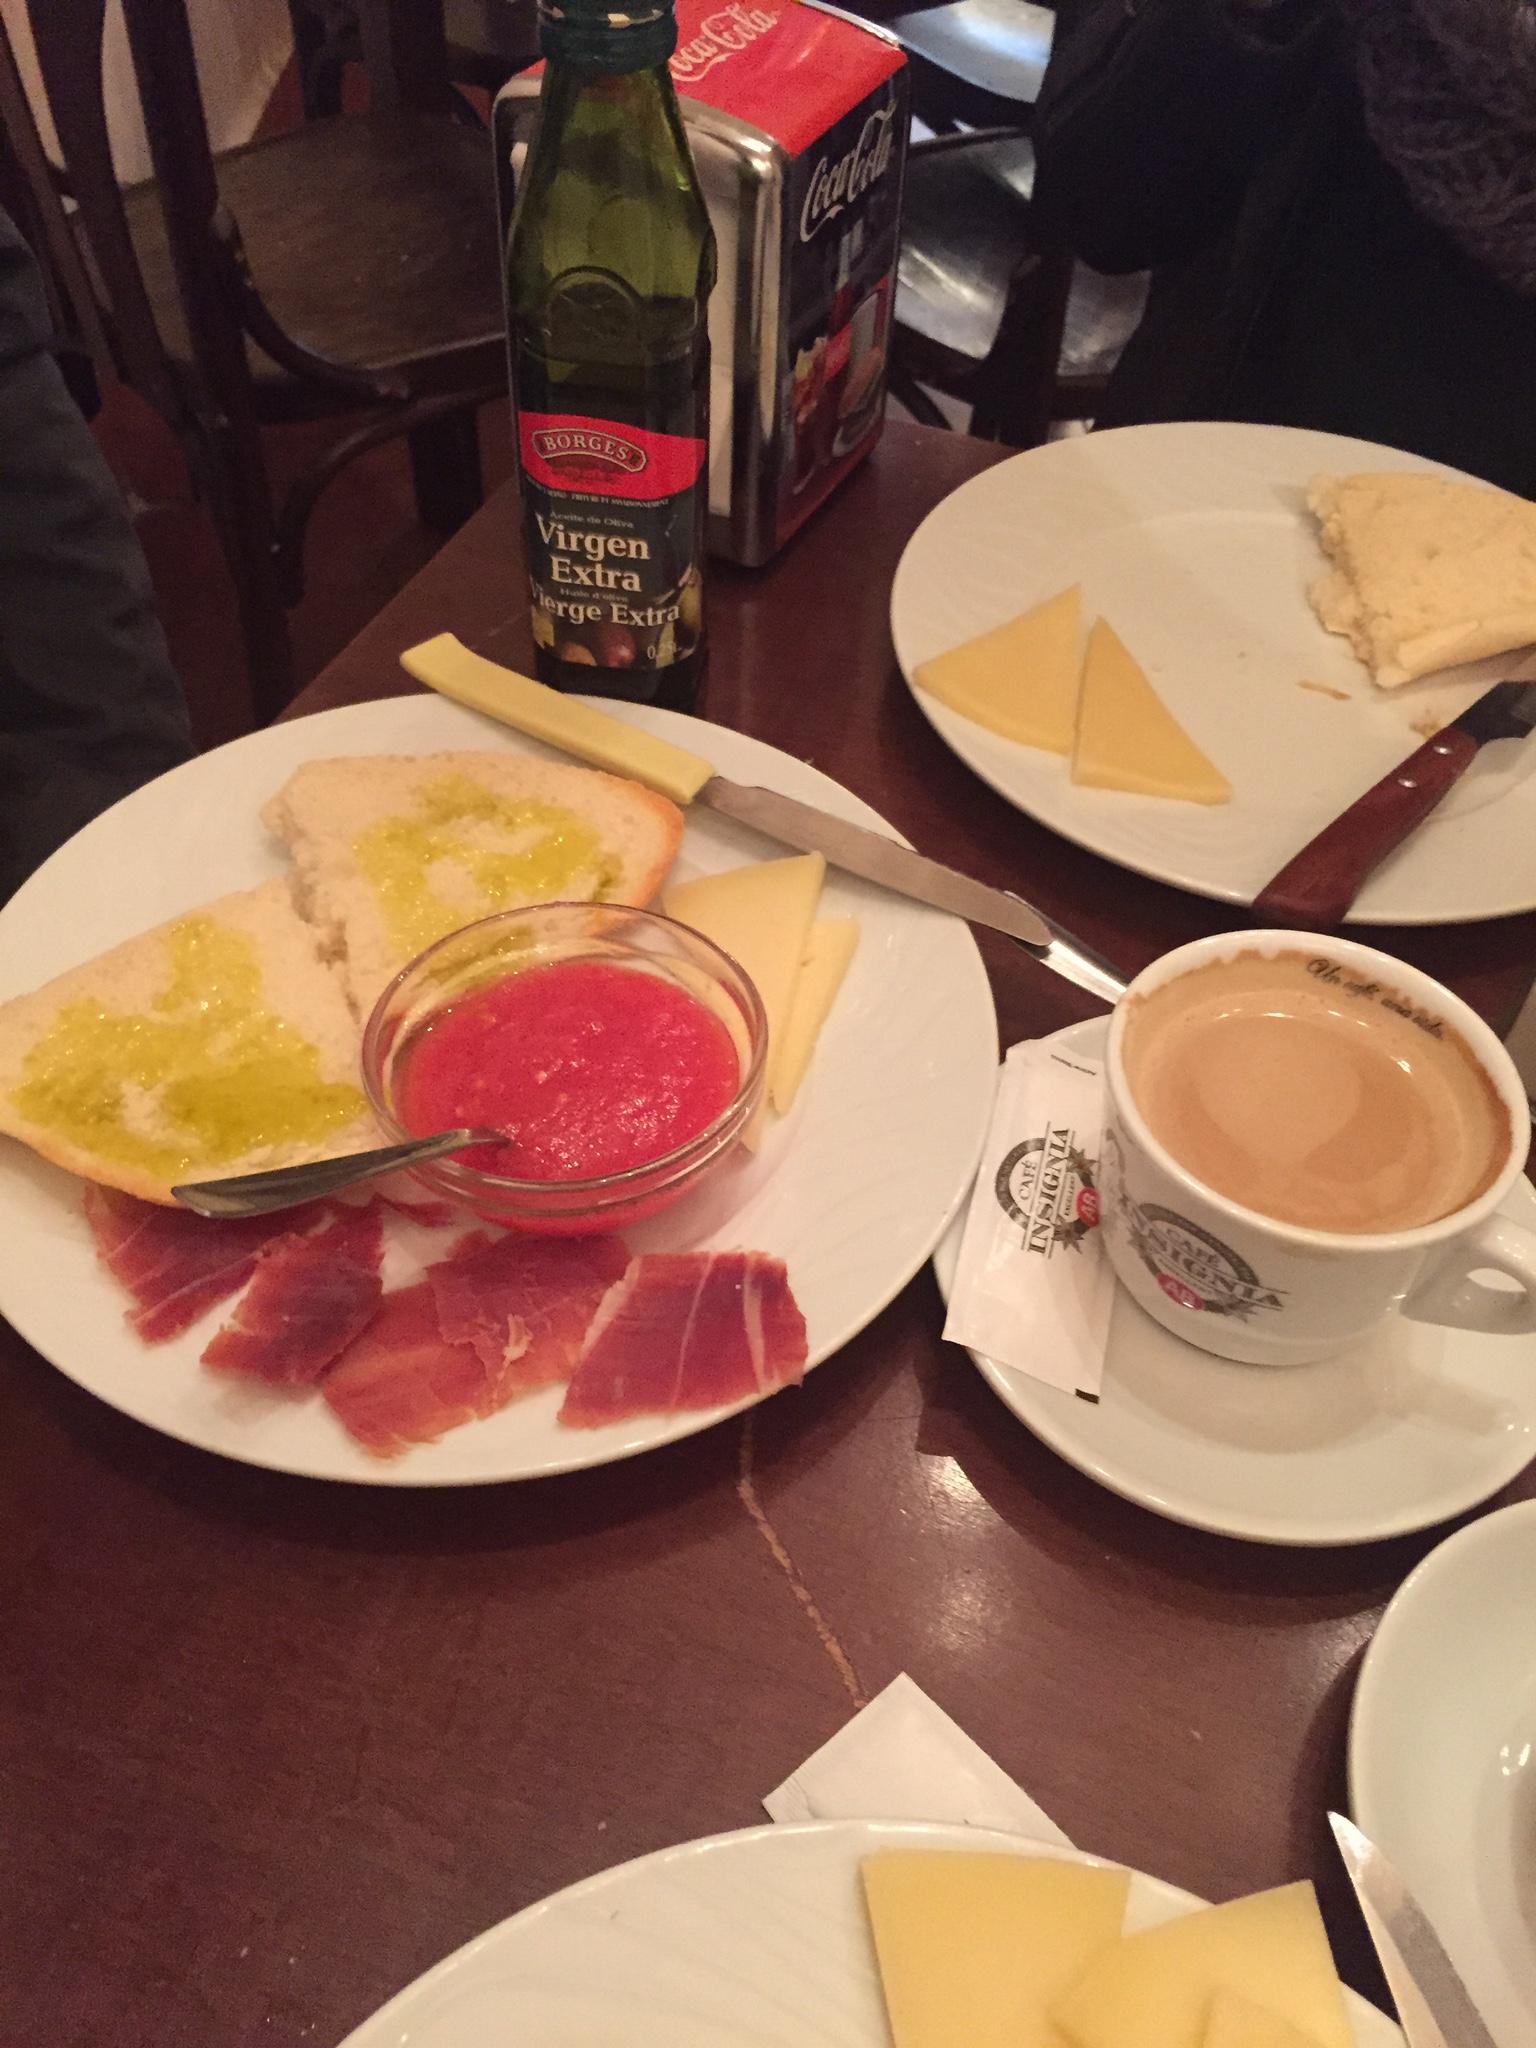 'Una media de tostada con tomate titulado, jamon iberico y aciete de oliva', afavorite breakfast combination...